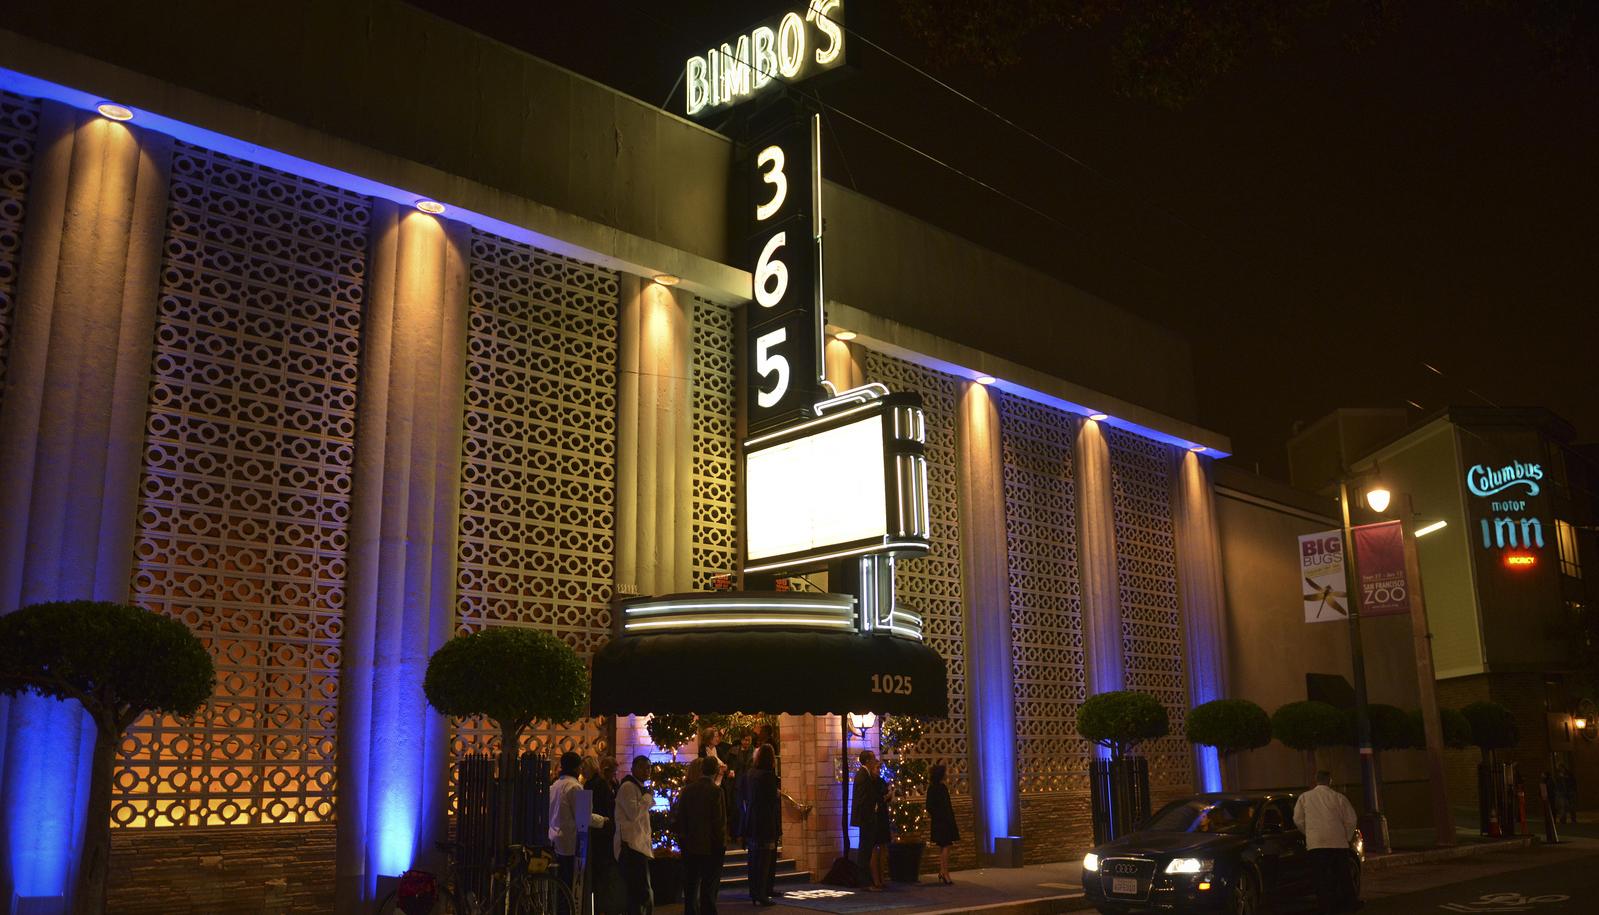 Rita Hayworth got her start at Bimbo's 365 supper club and speakeasy in 1931.